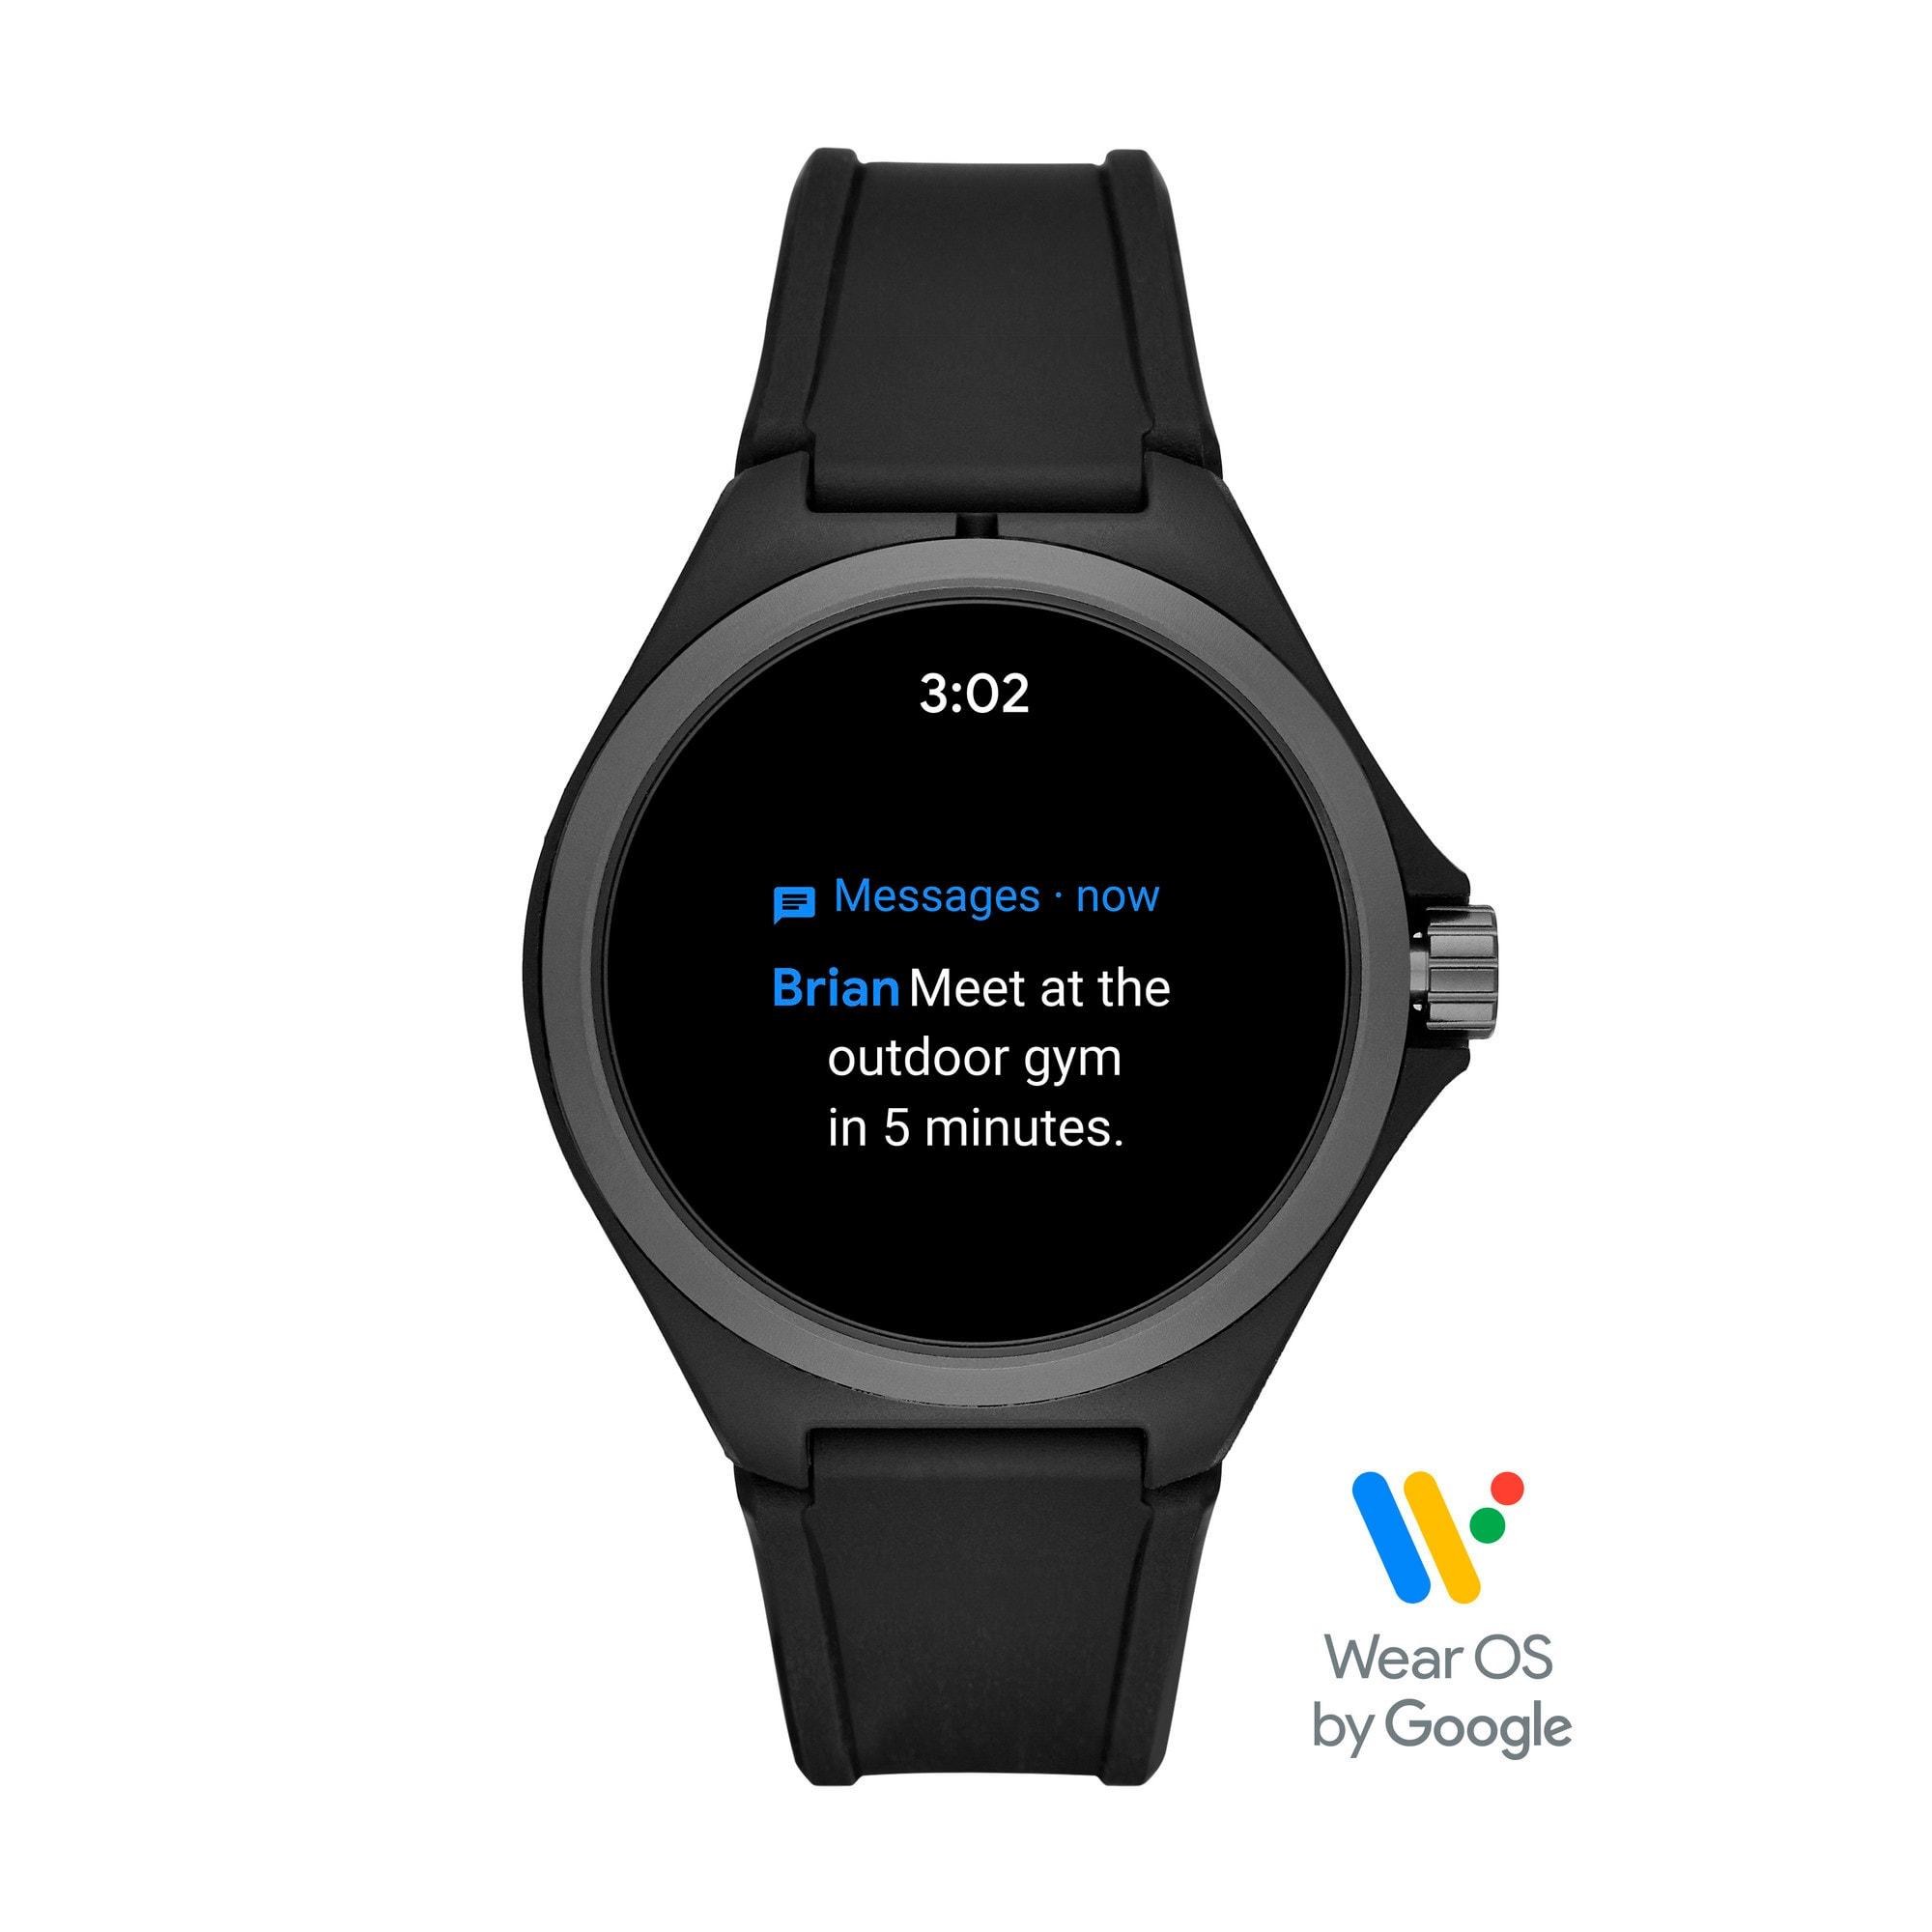 Thumbnail 6 of PUMA Smartwatch, Black/Gray, medium